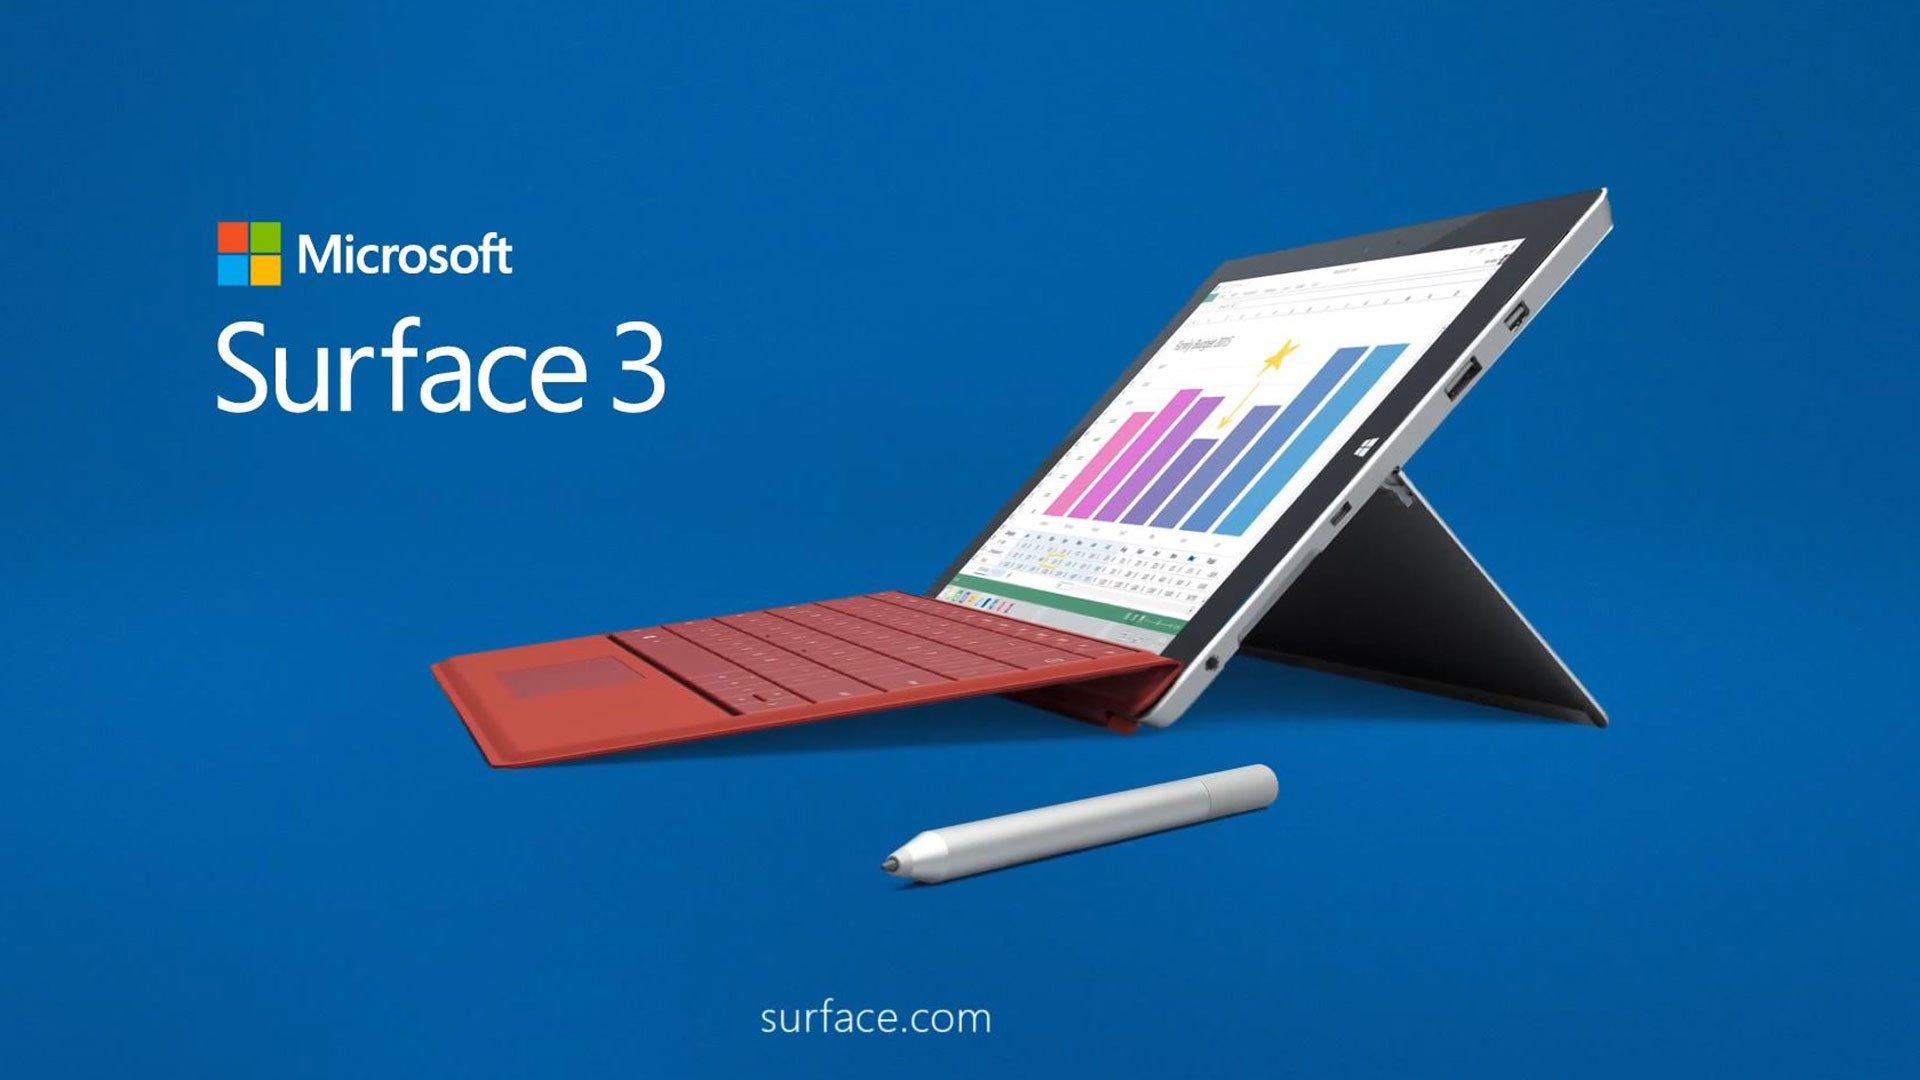 Wallpaper Hd Hp Deal Surface 3 Edu Bundle Inkl Stylus Stift Und Type